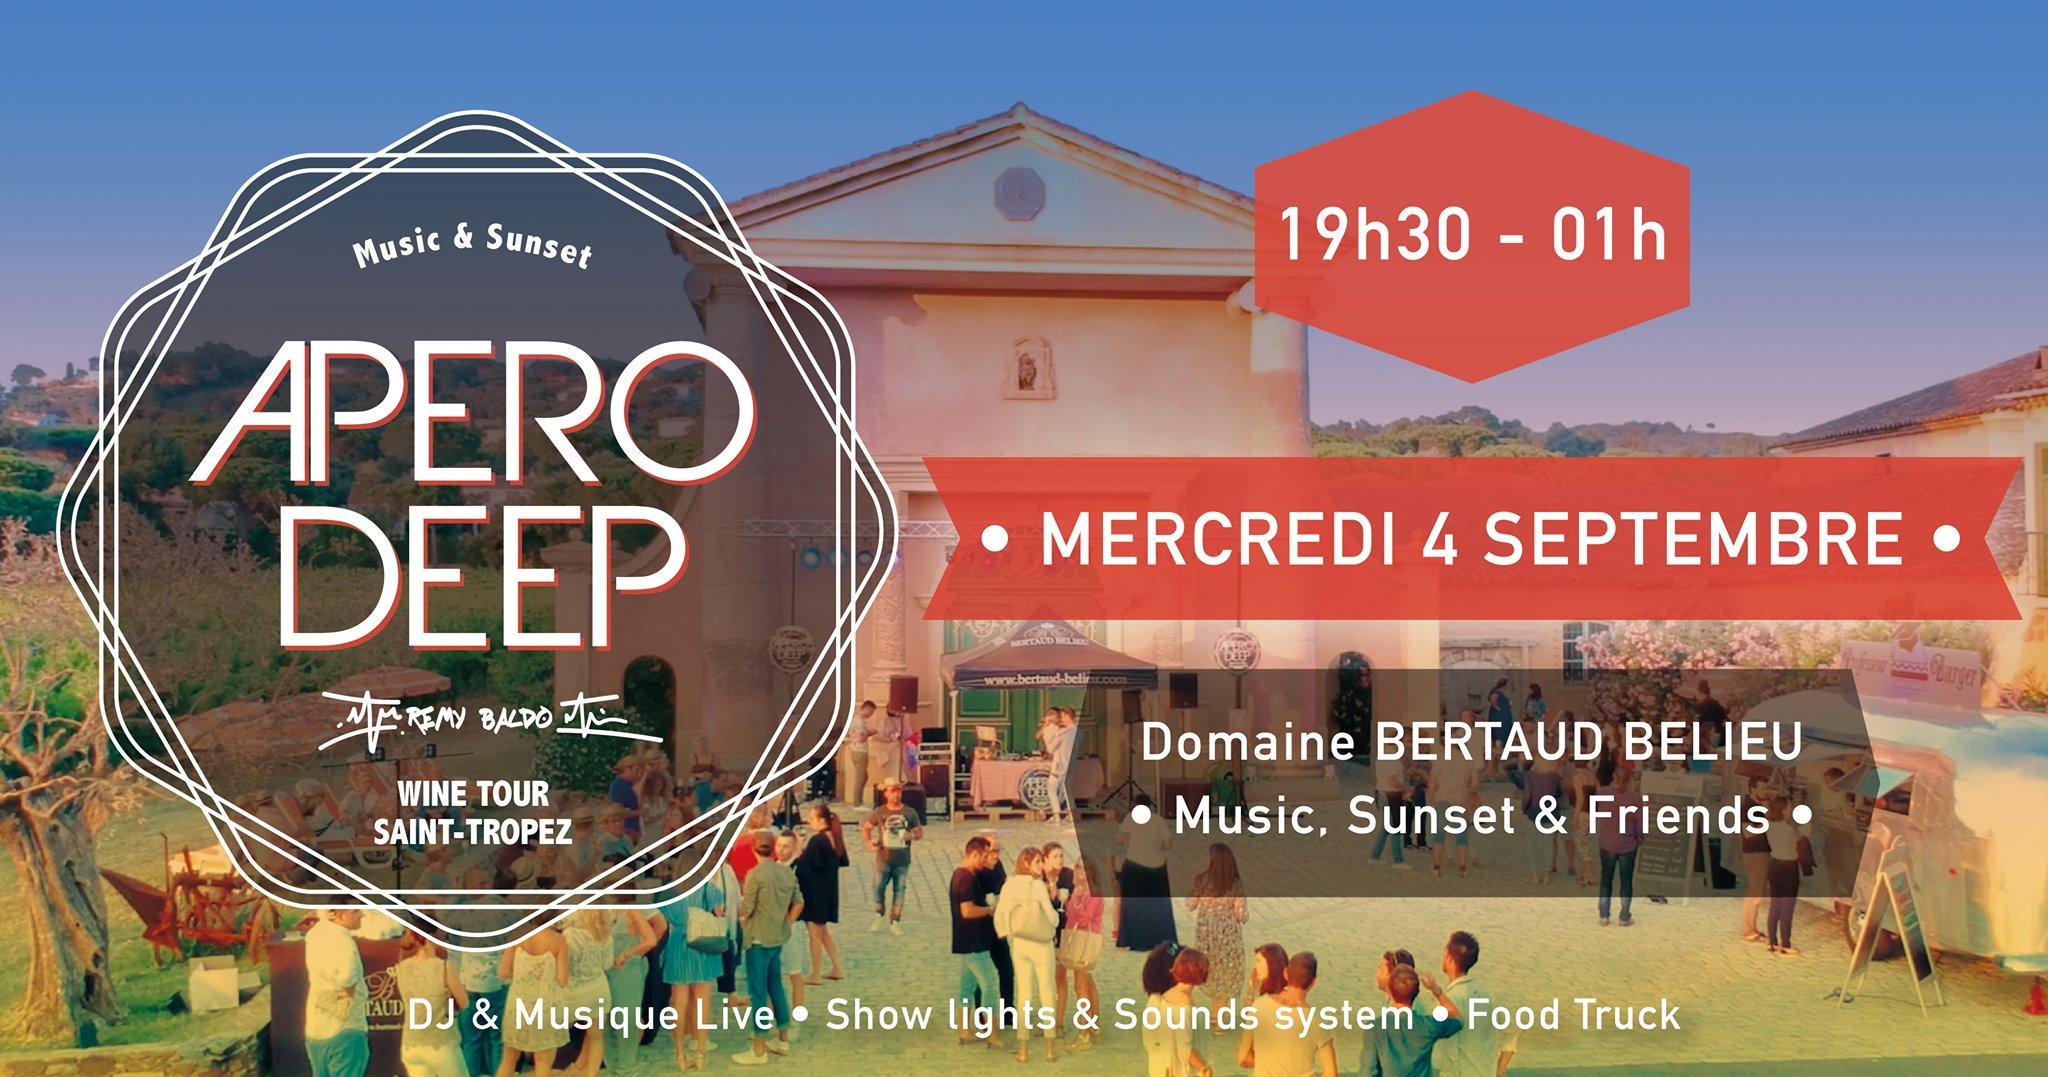 04.09 Apéro Deep / Domaine Bertaud Belieu / Gassin-St Tropez